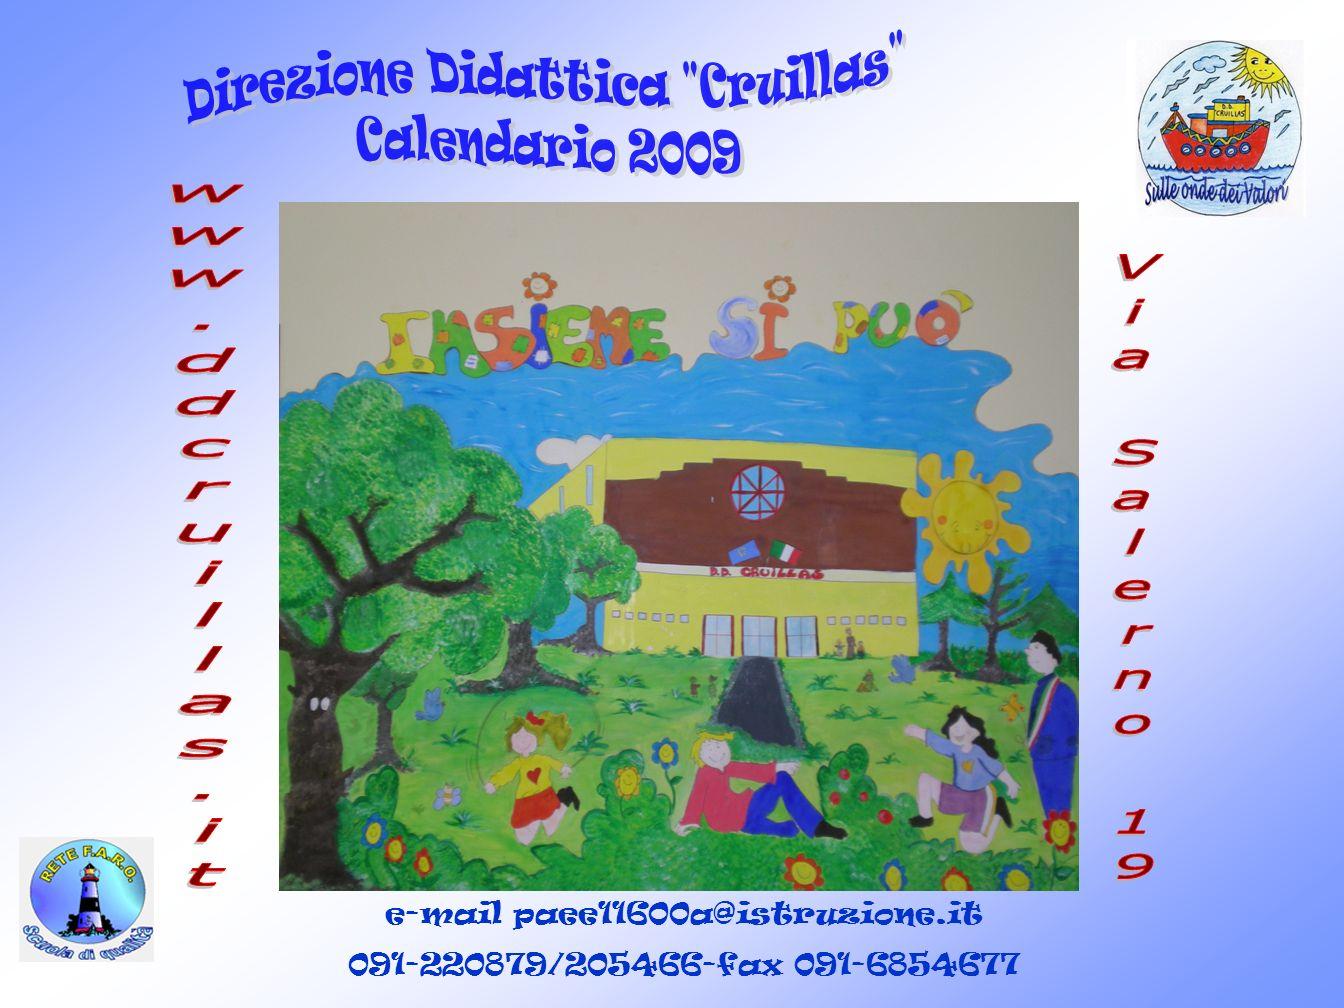 e-mail paee11600a@istruzione.it 091-220879/205466-fax 091-6854677